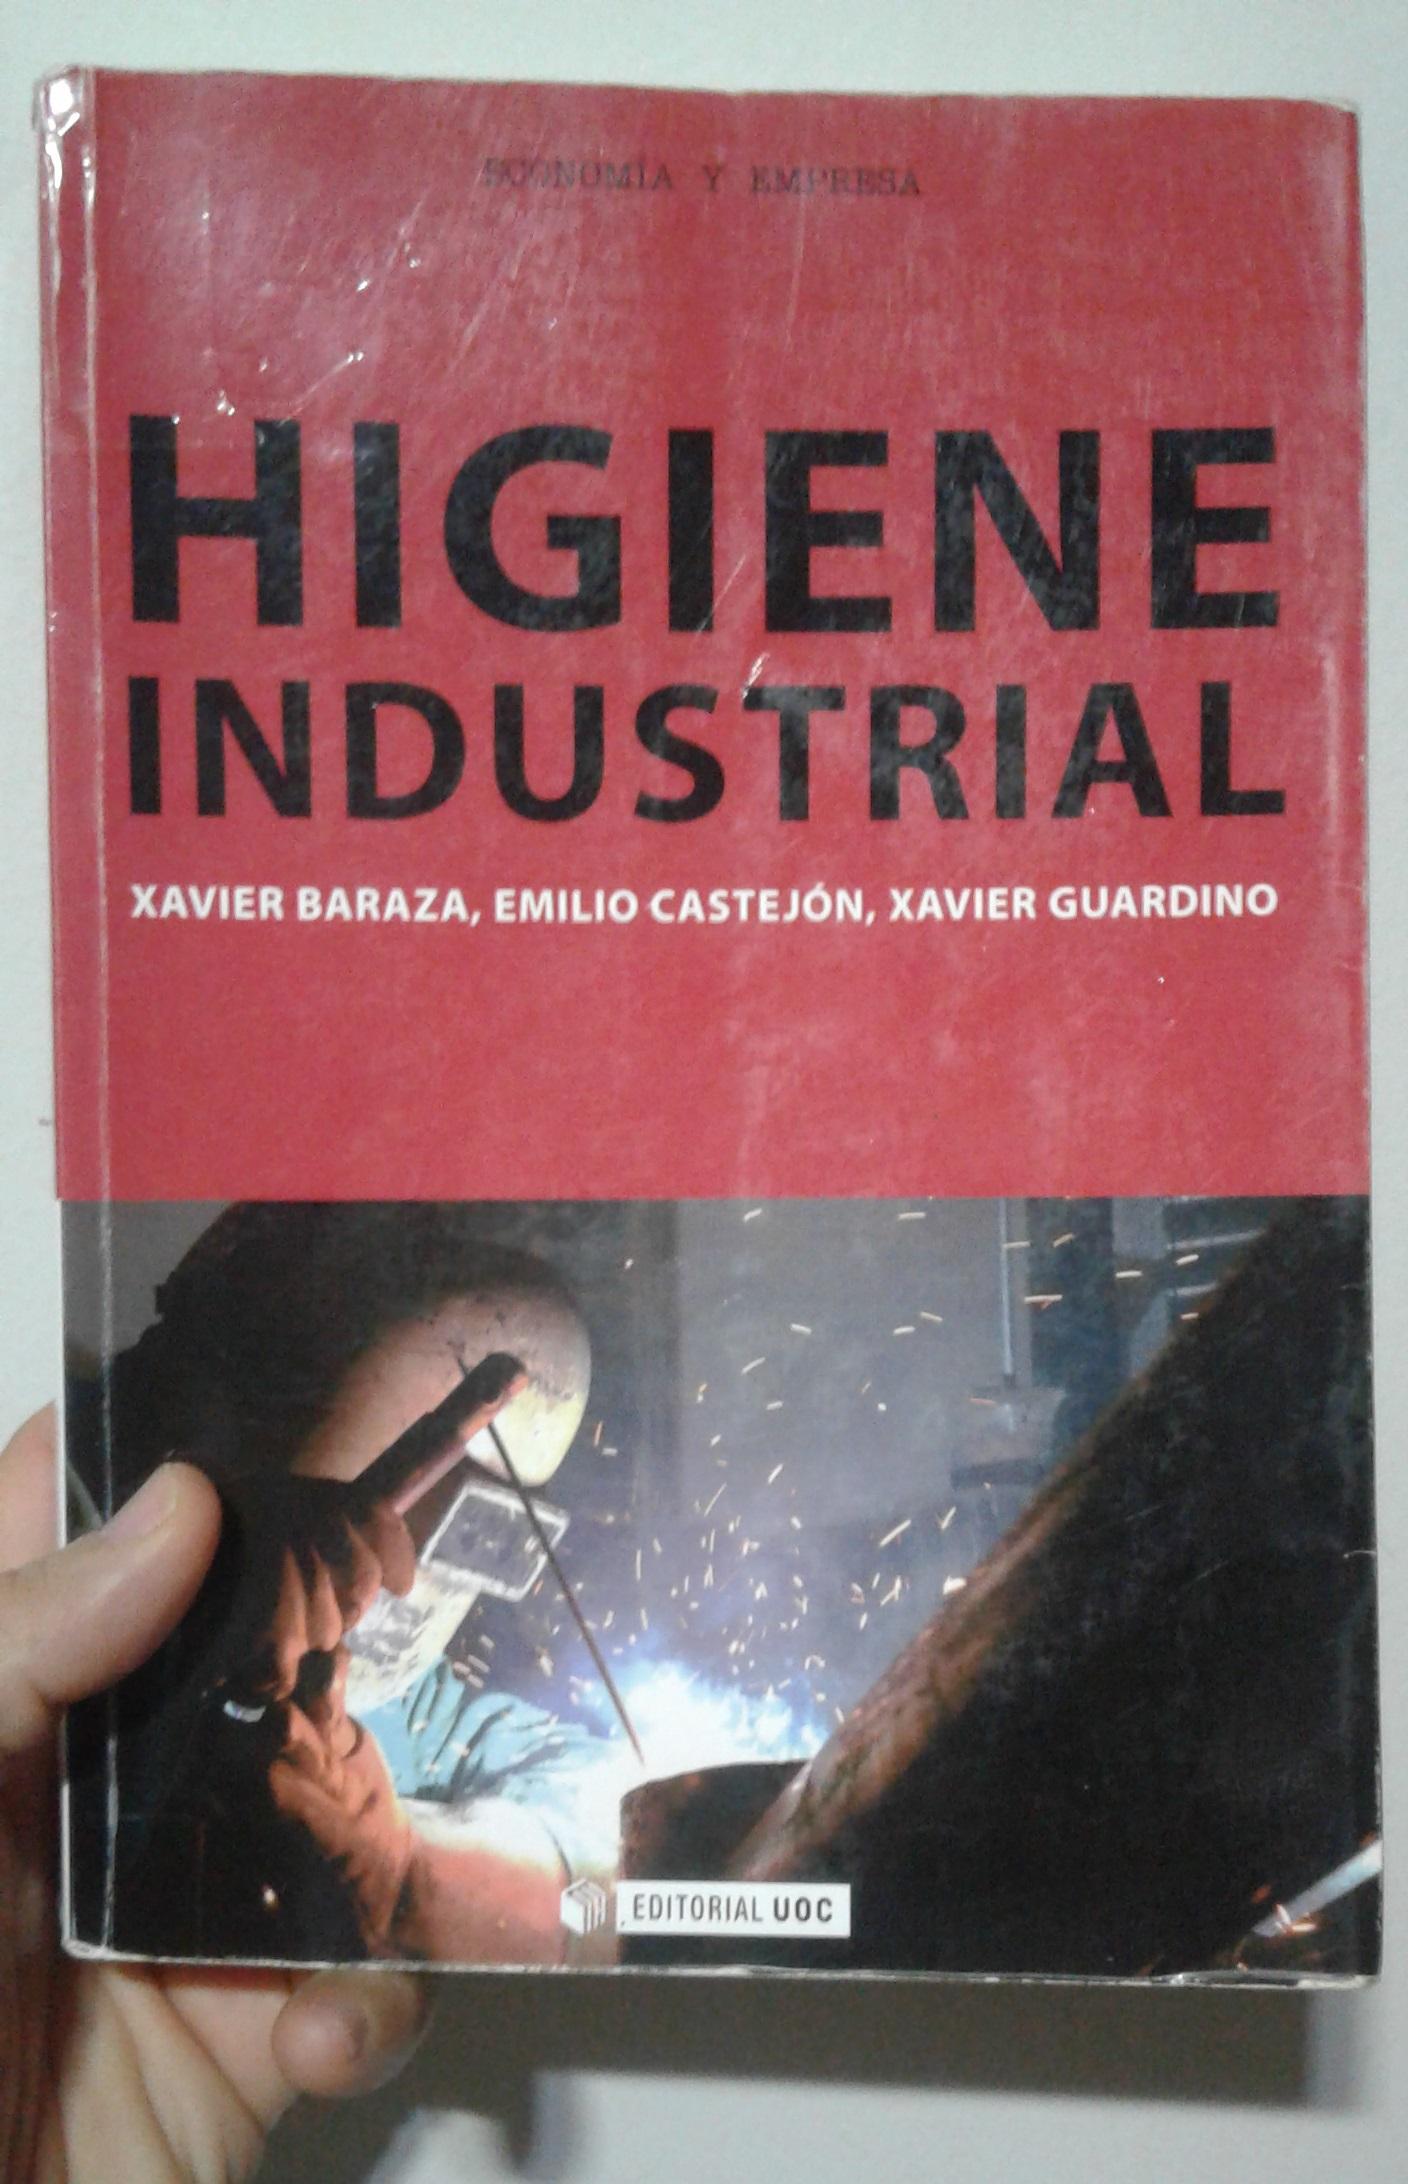 Higiene Industrial - Xavier Baranza